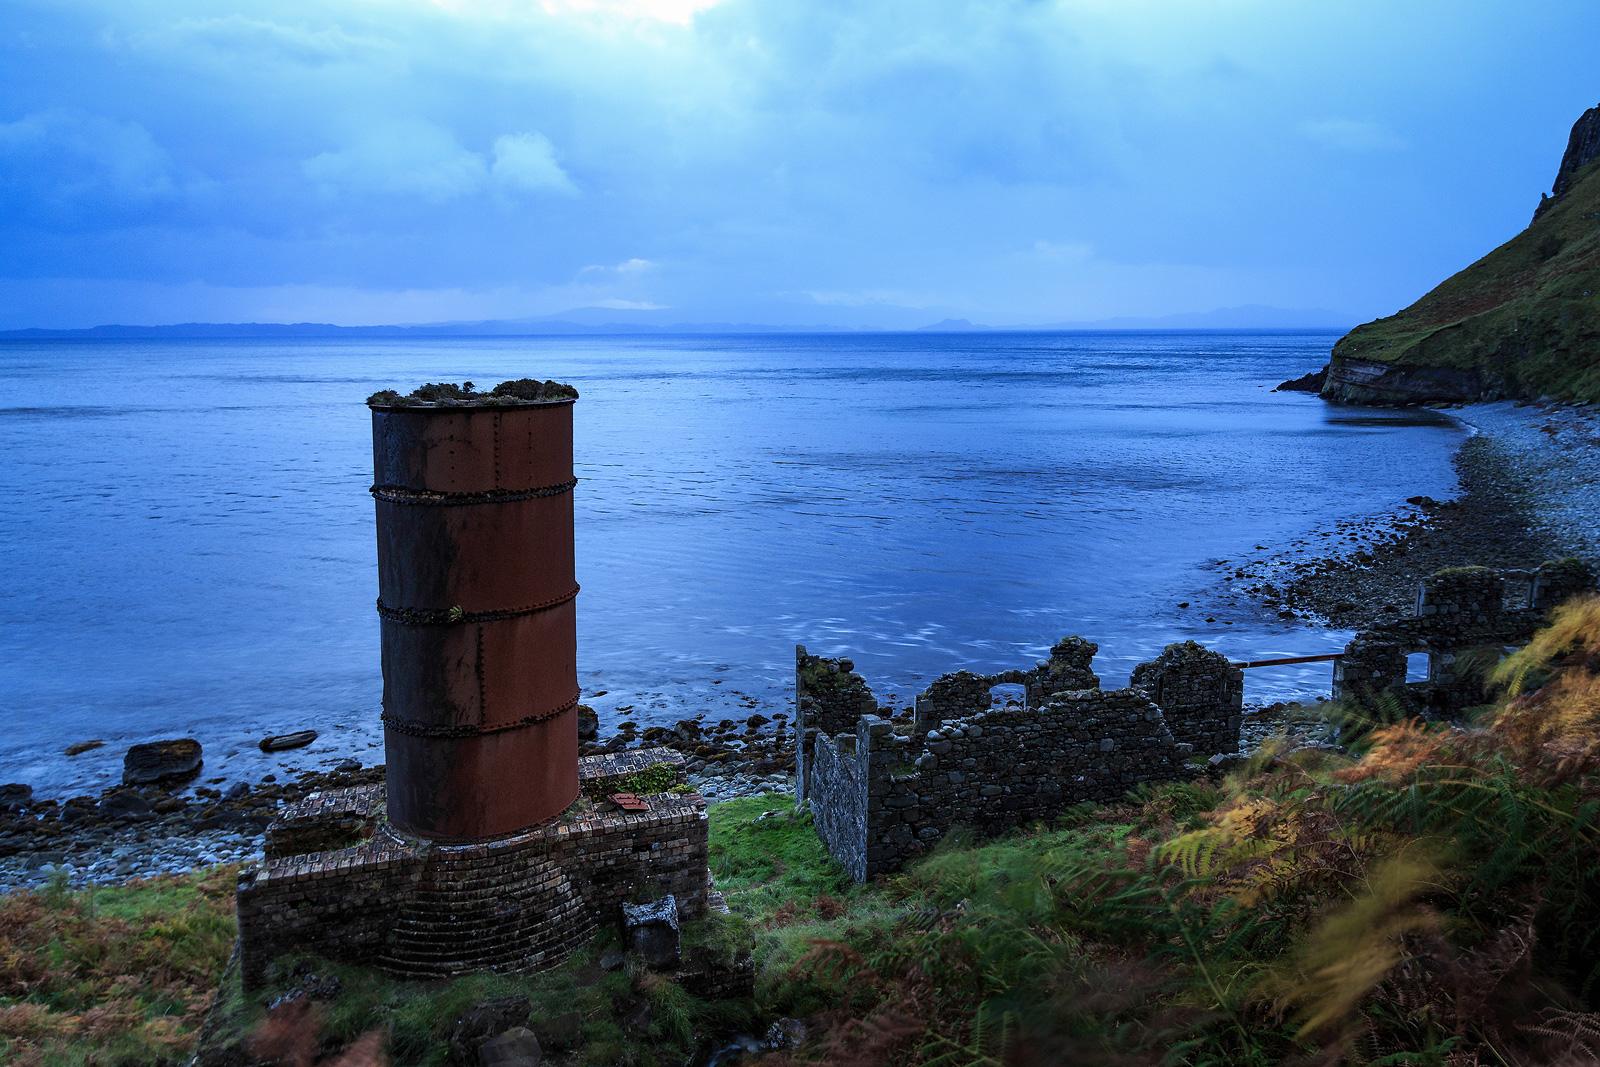 Fotospot Lealt Falls, Isle of Sky, Schottland, kathrinsworld, Kathrin's World